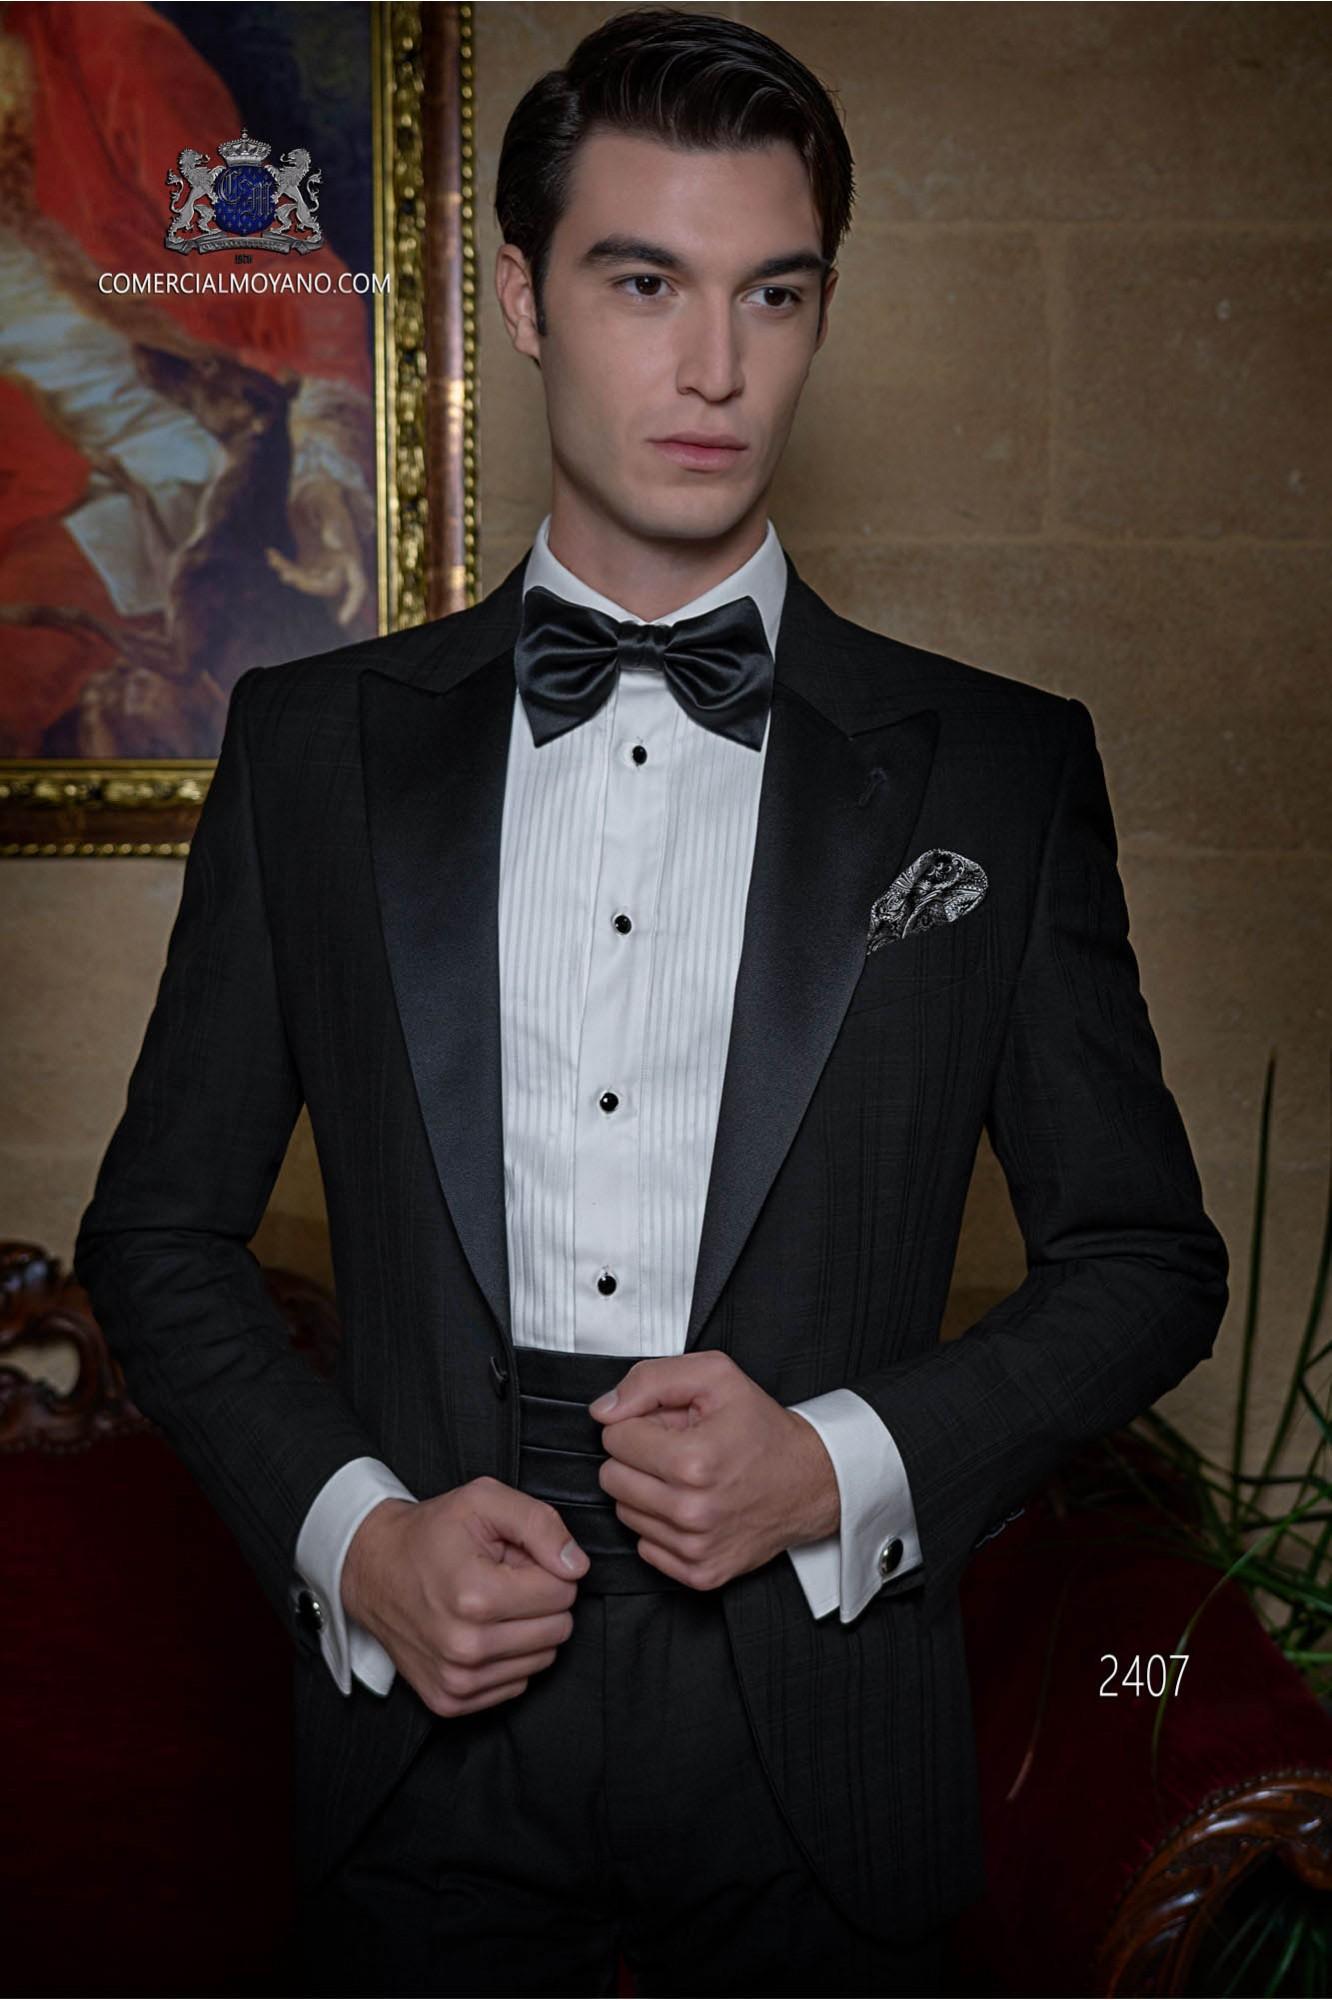 Italian bespoke black breasted tuxedo model 2407 Ottavio Nuccio Gala